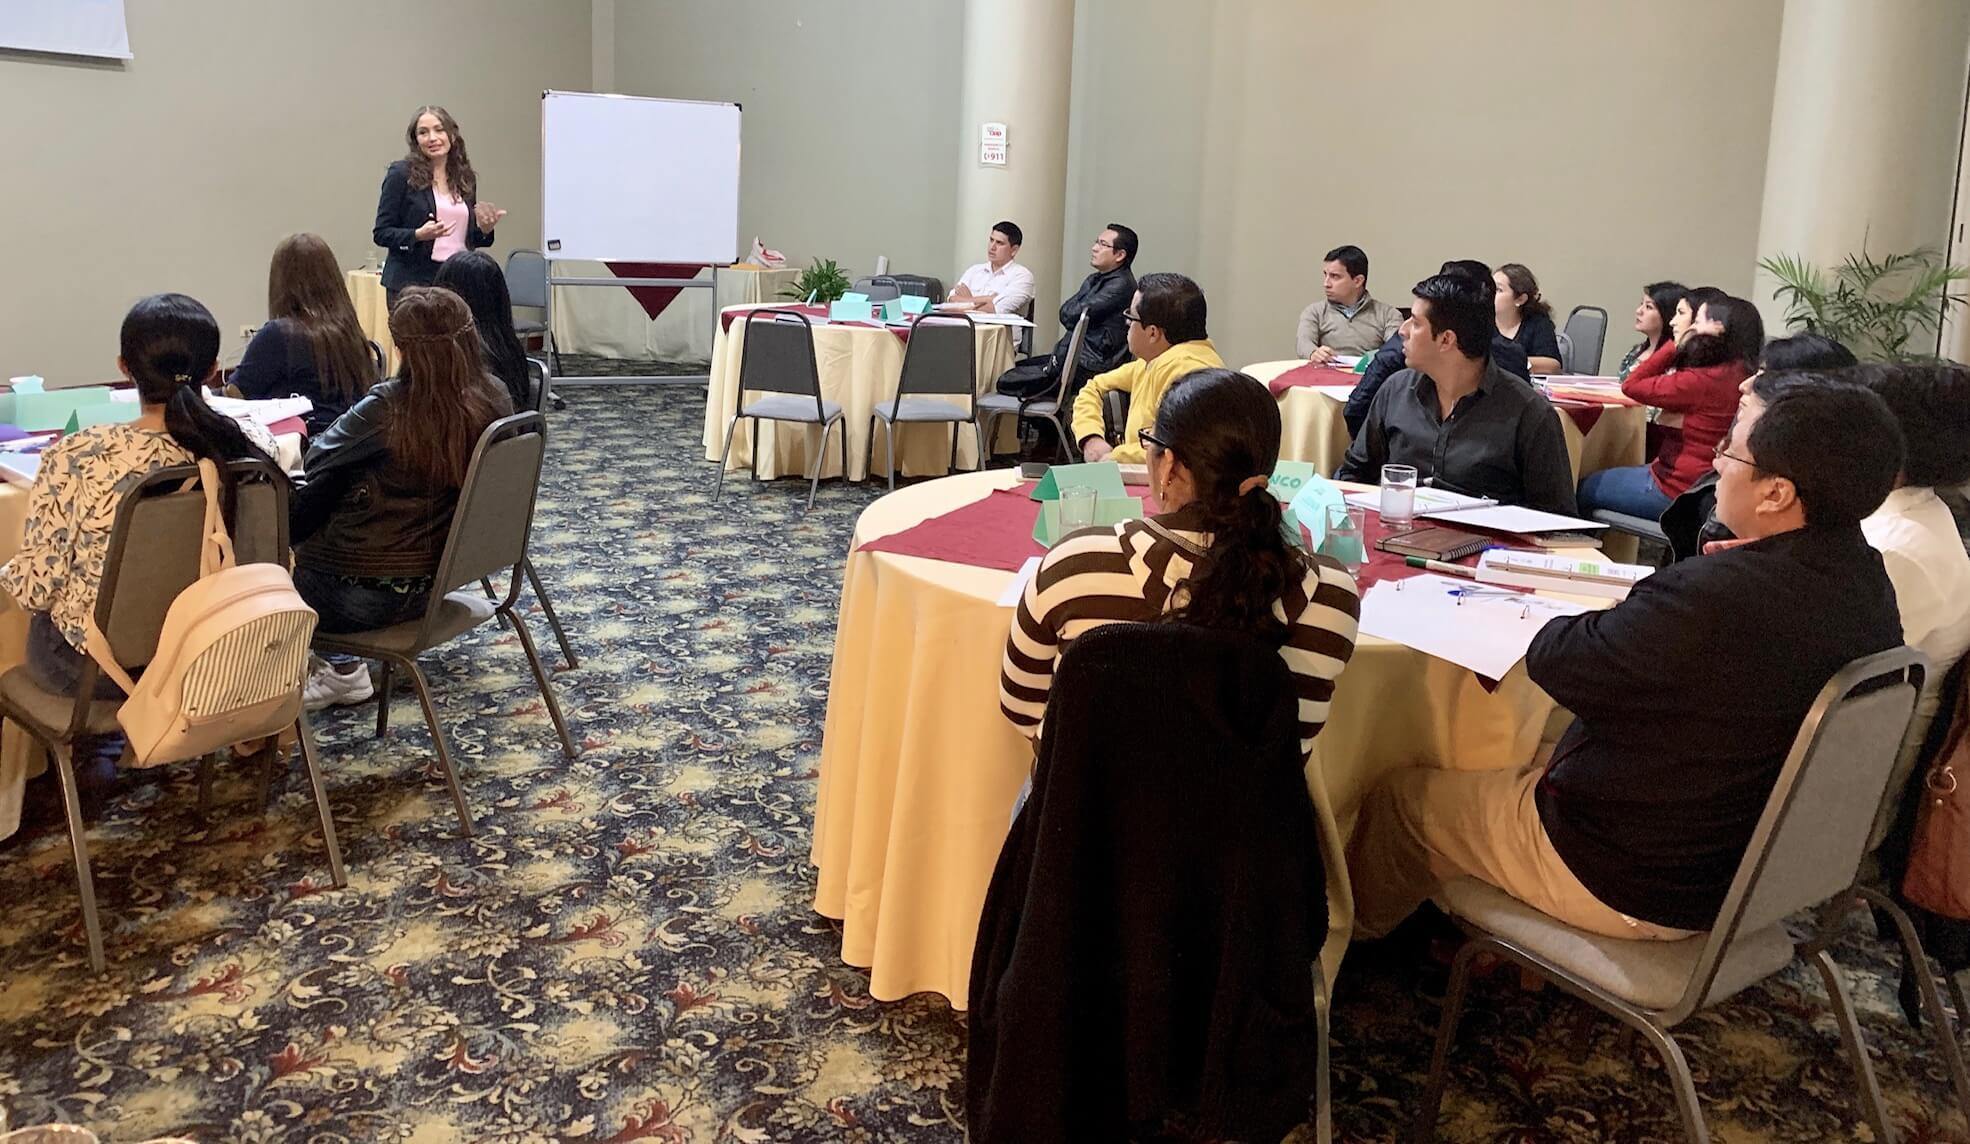 Programa Internacional de Desarrollo de Mandos Medios -Módulo 4 Fundación FACES - Loja, Ecuador - Capacitación empresarial por IDEASGROUP Ecuador